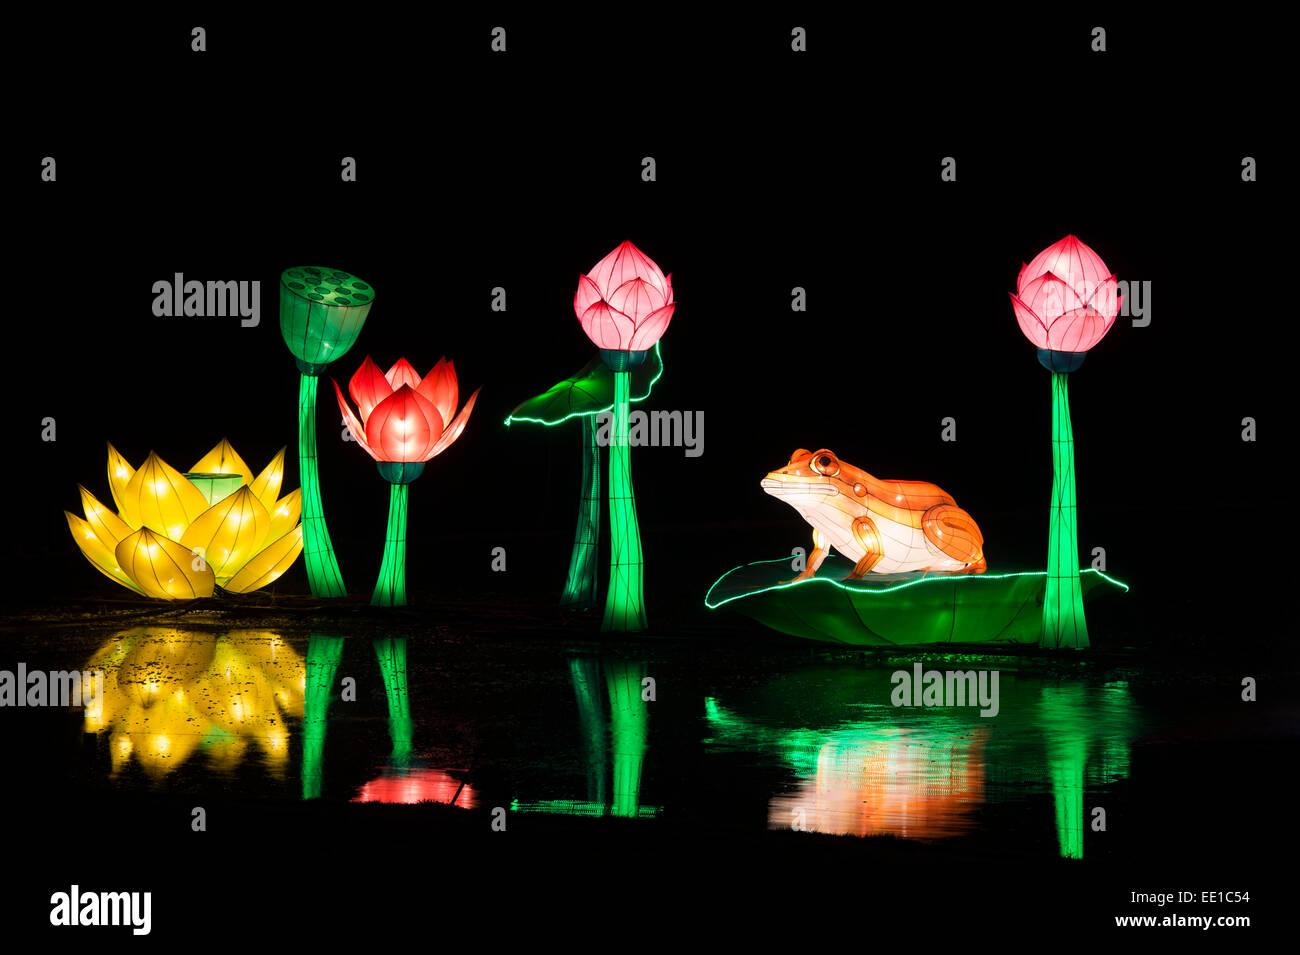 Frog and lotus flower chinese lanterns floating on the pond at stock frog and lotus flower chinese lanterns floating on the pond at longleat warminster wiltshire england izmirmasajfo